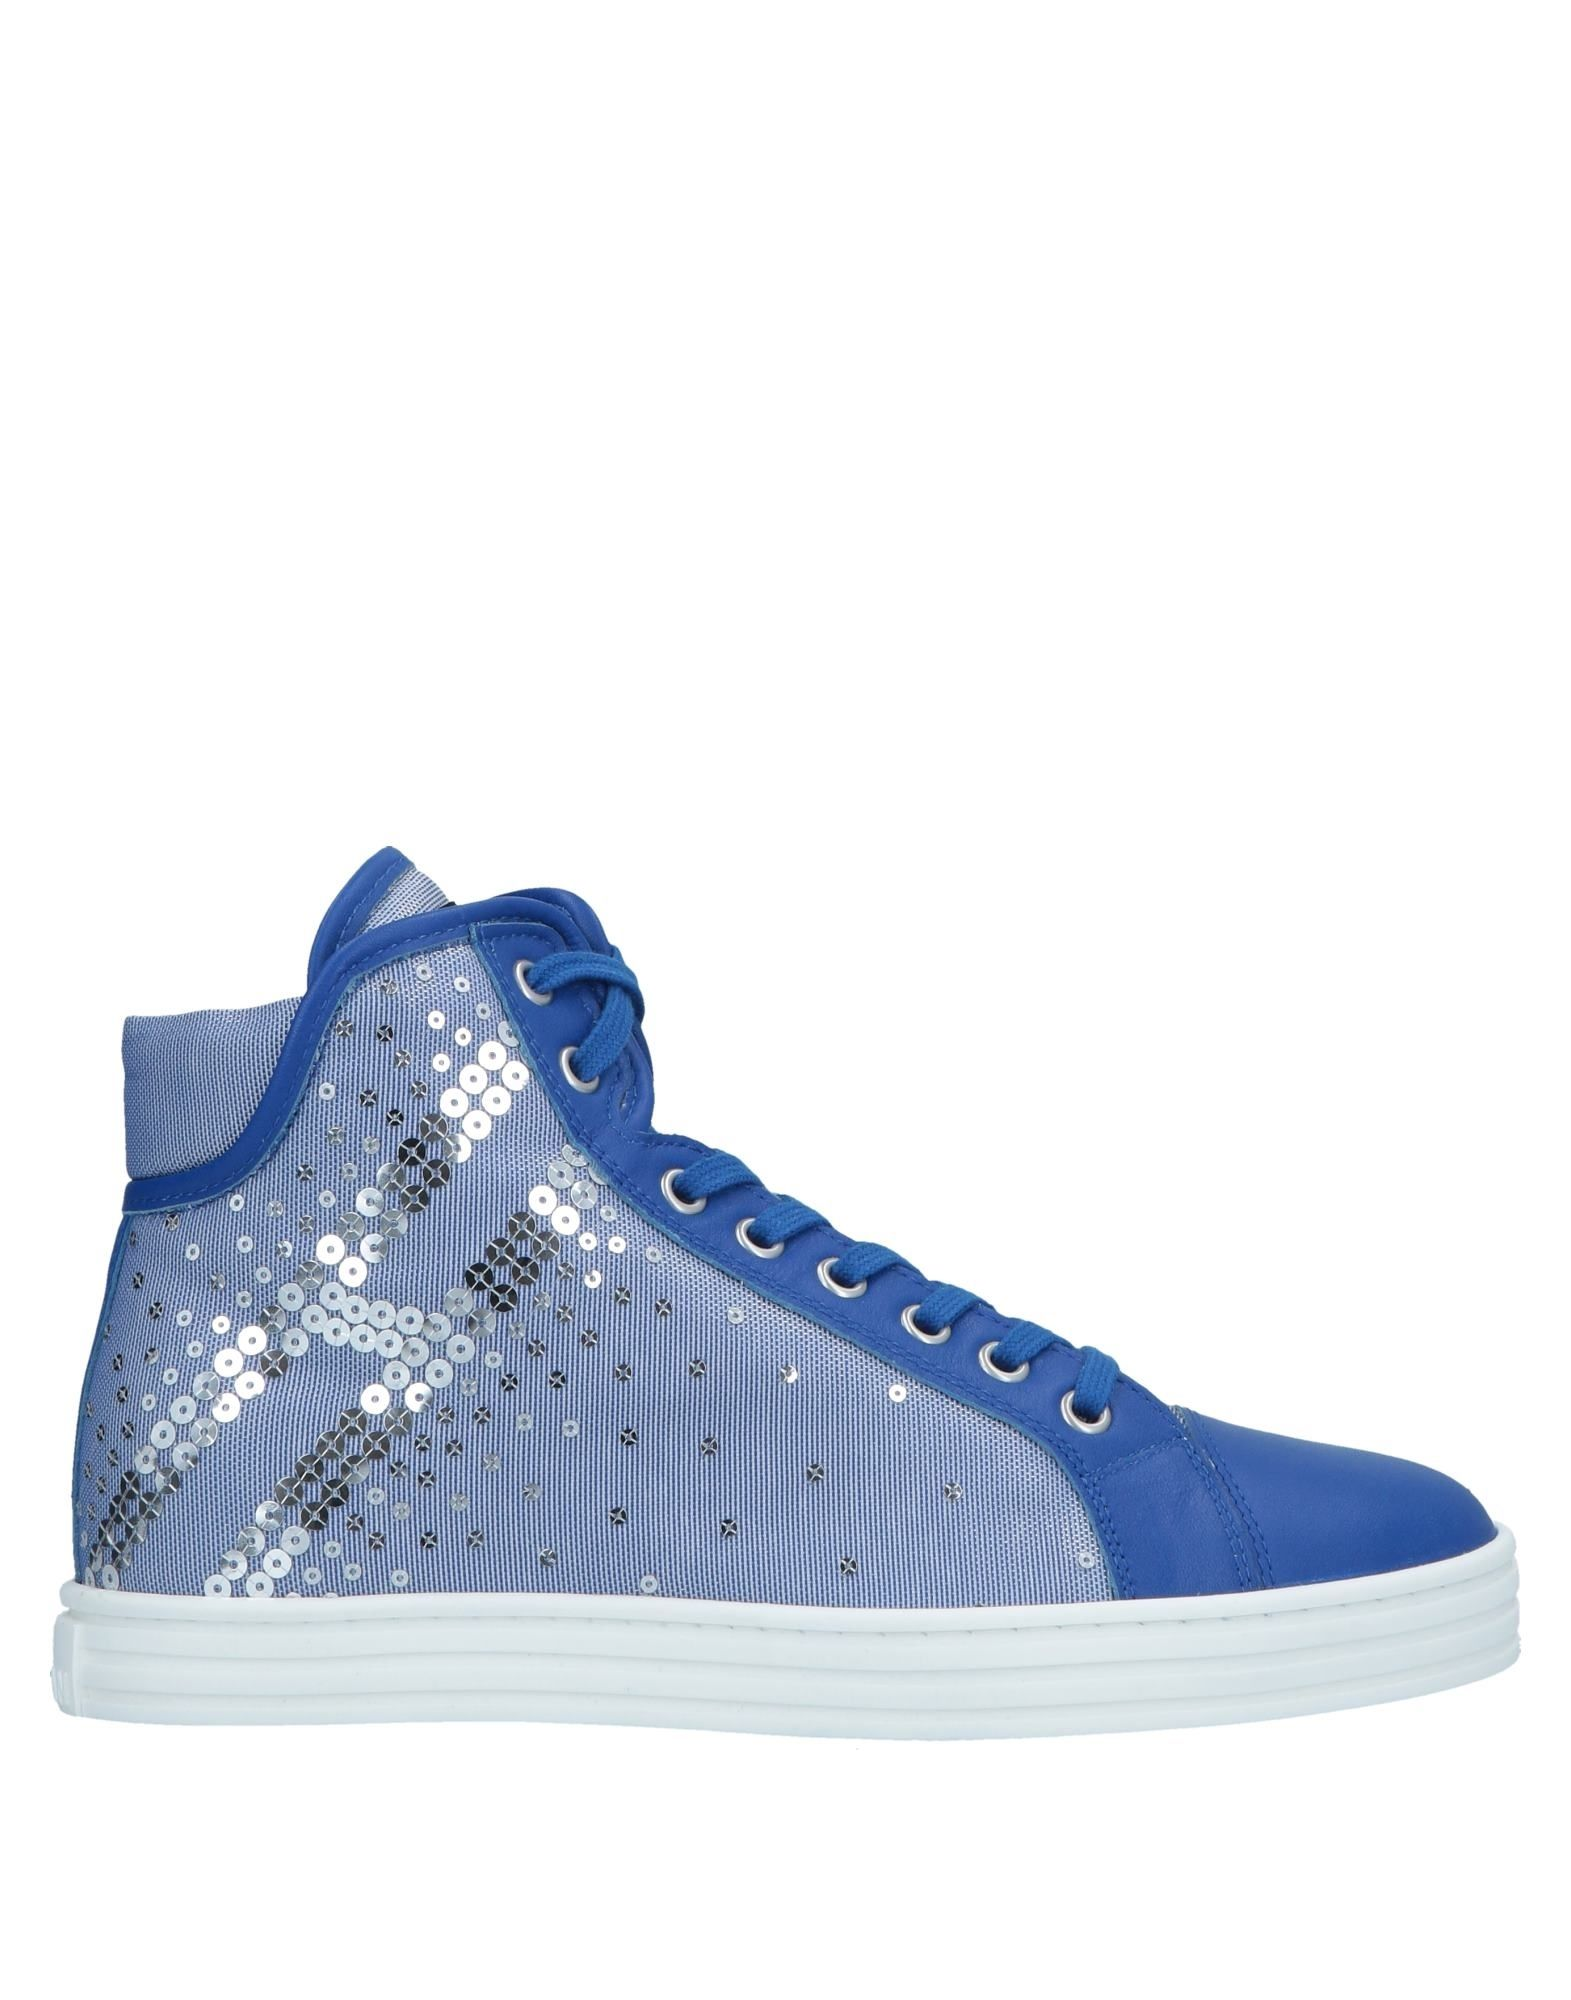 Hogan Rebel Sneakers In Blue | ModeSens